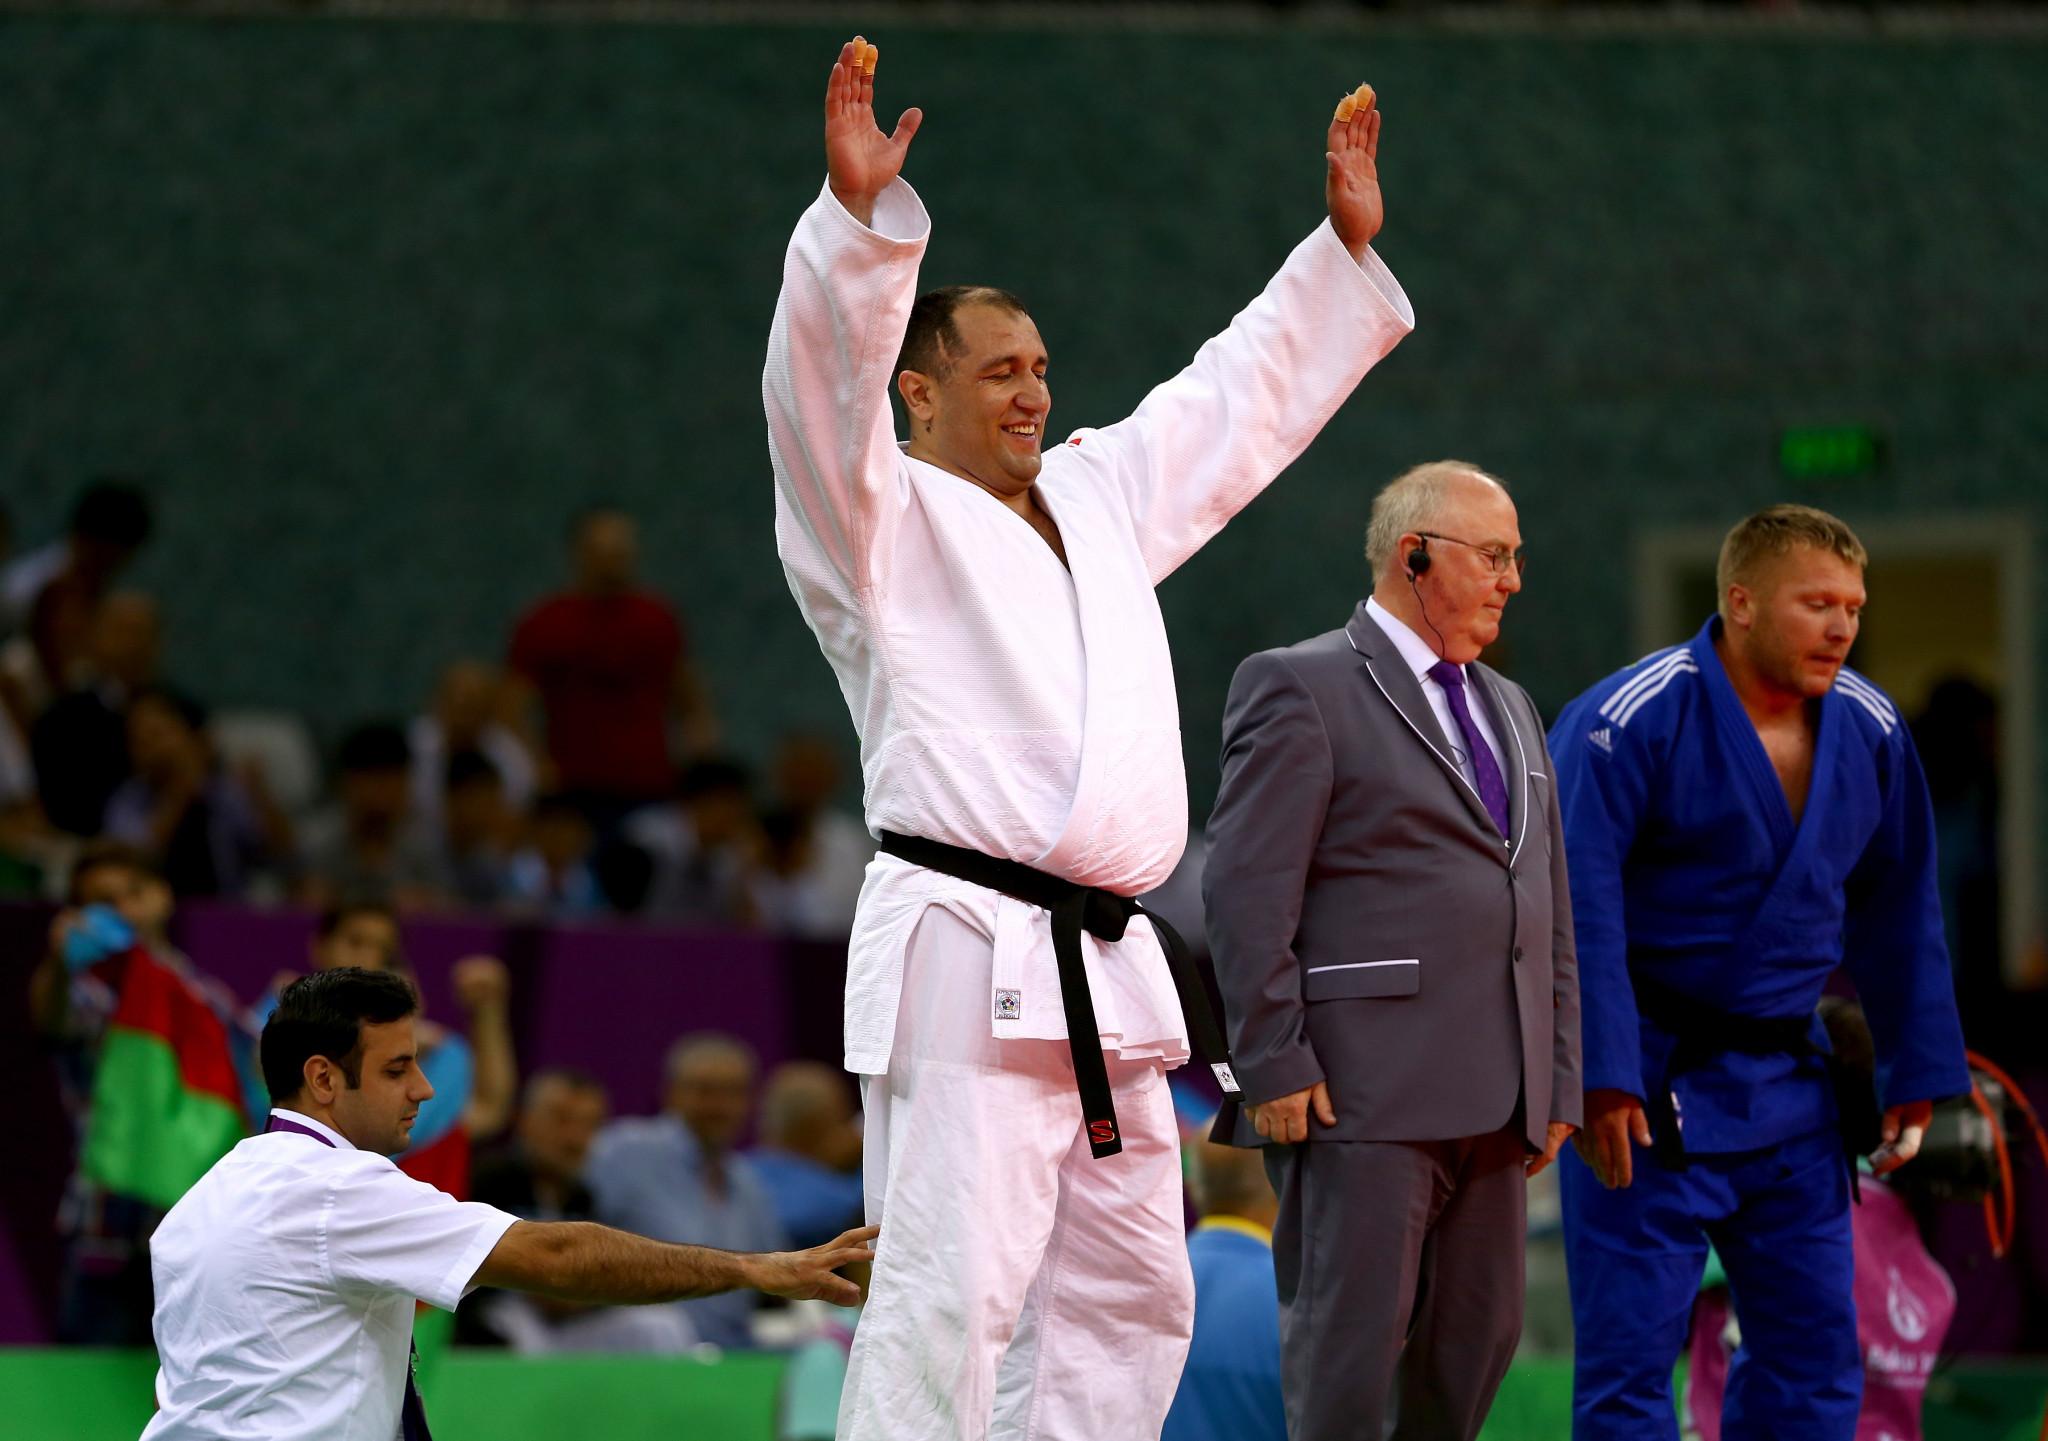 Zakiyev relishing return to action at home IBSA Judo Grand Prix in Baku